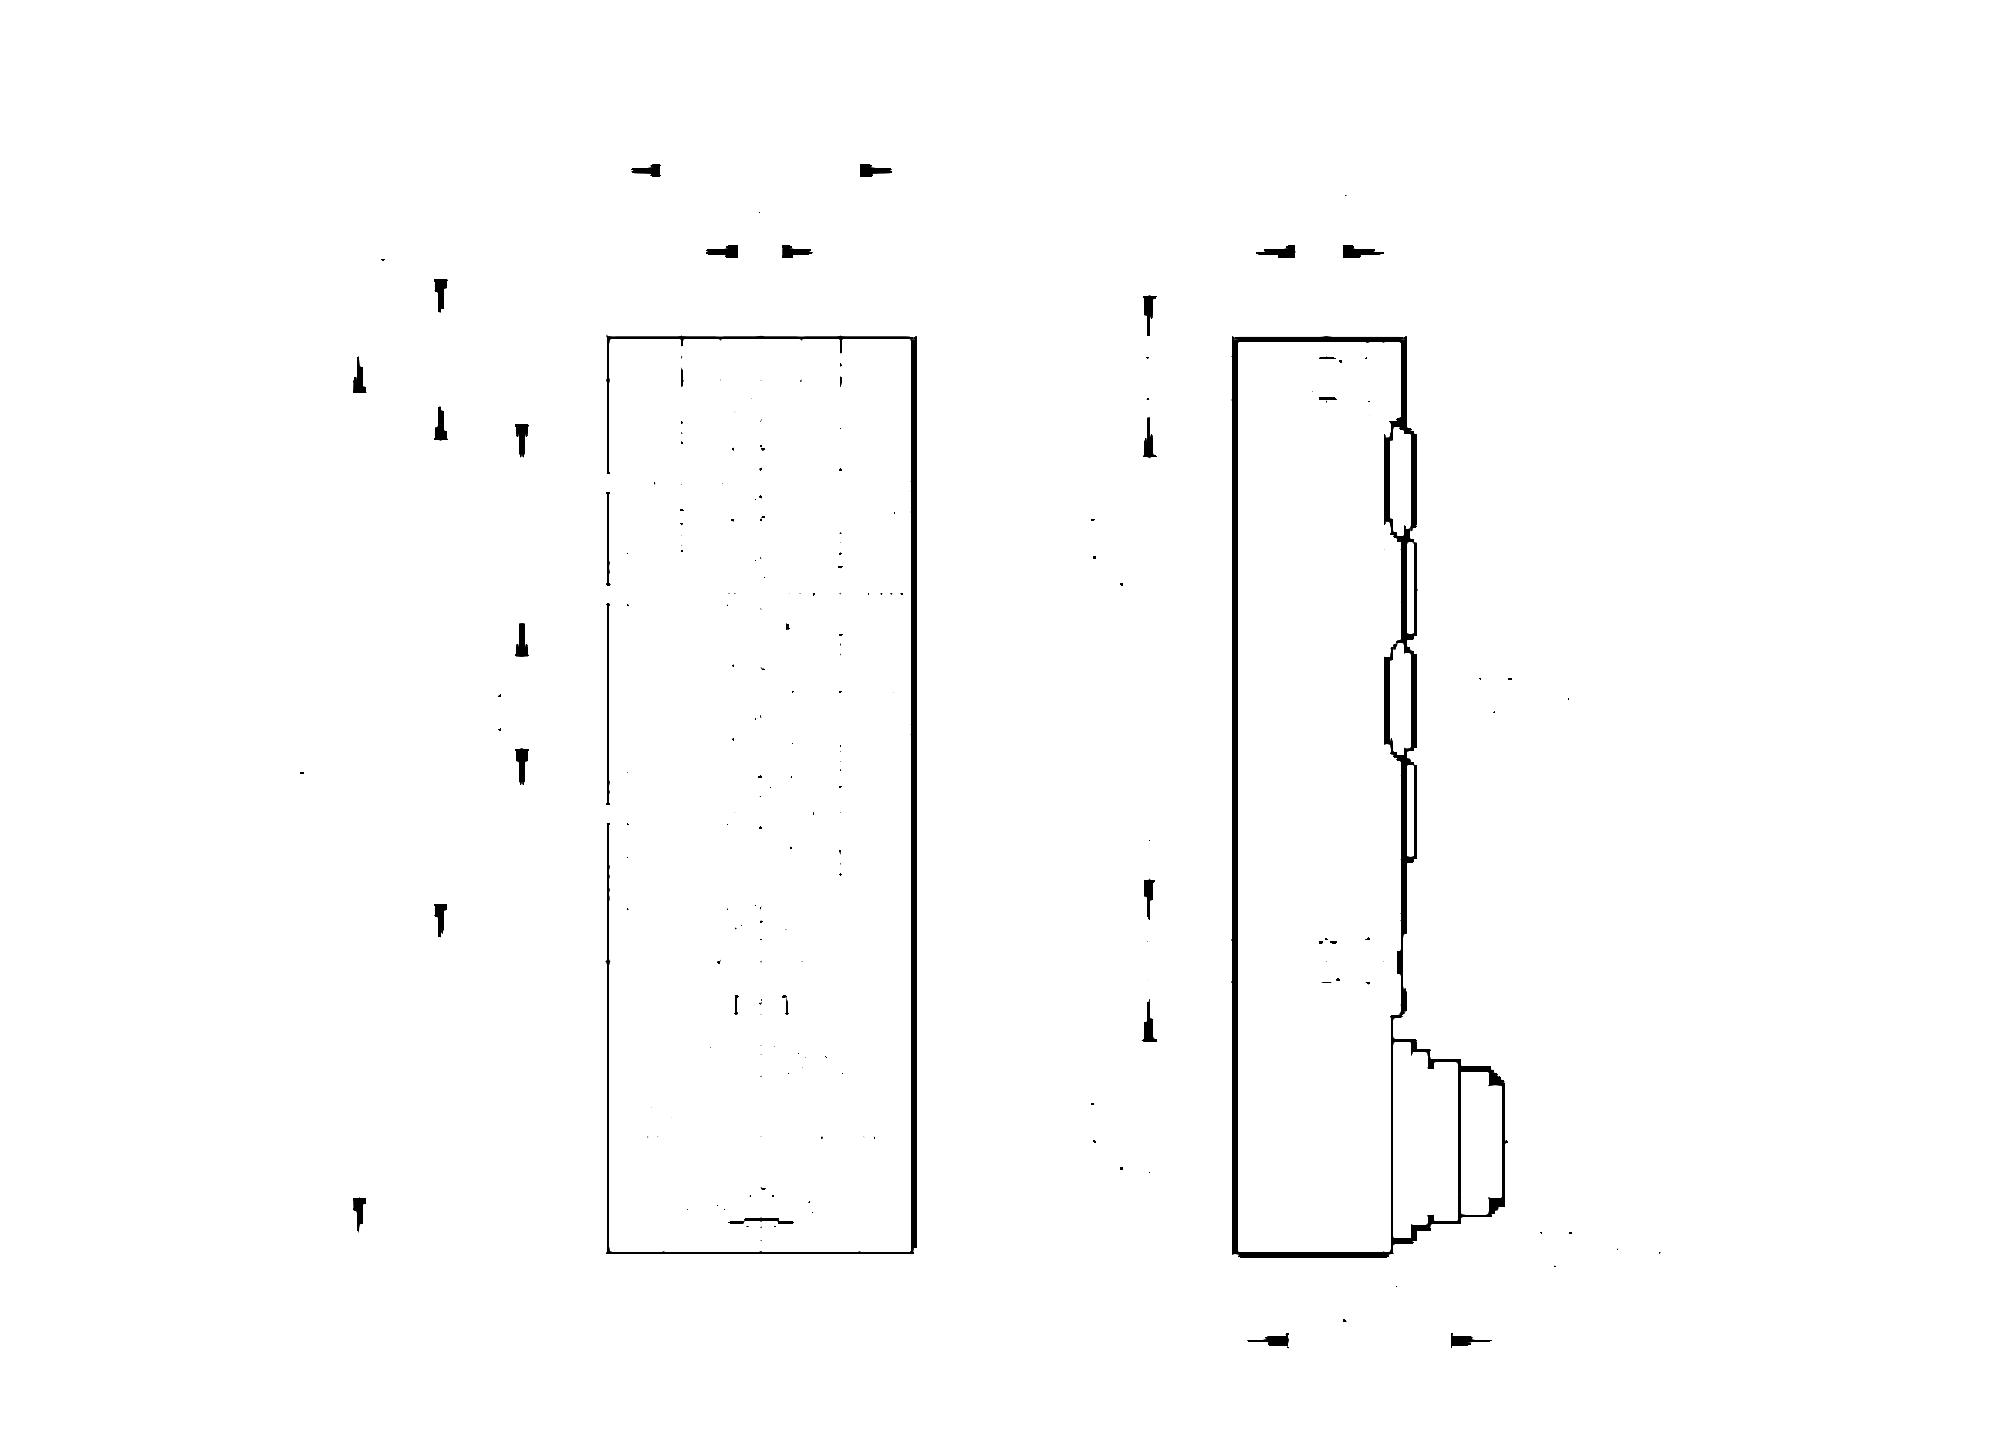 ebc053 - wiring block